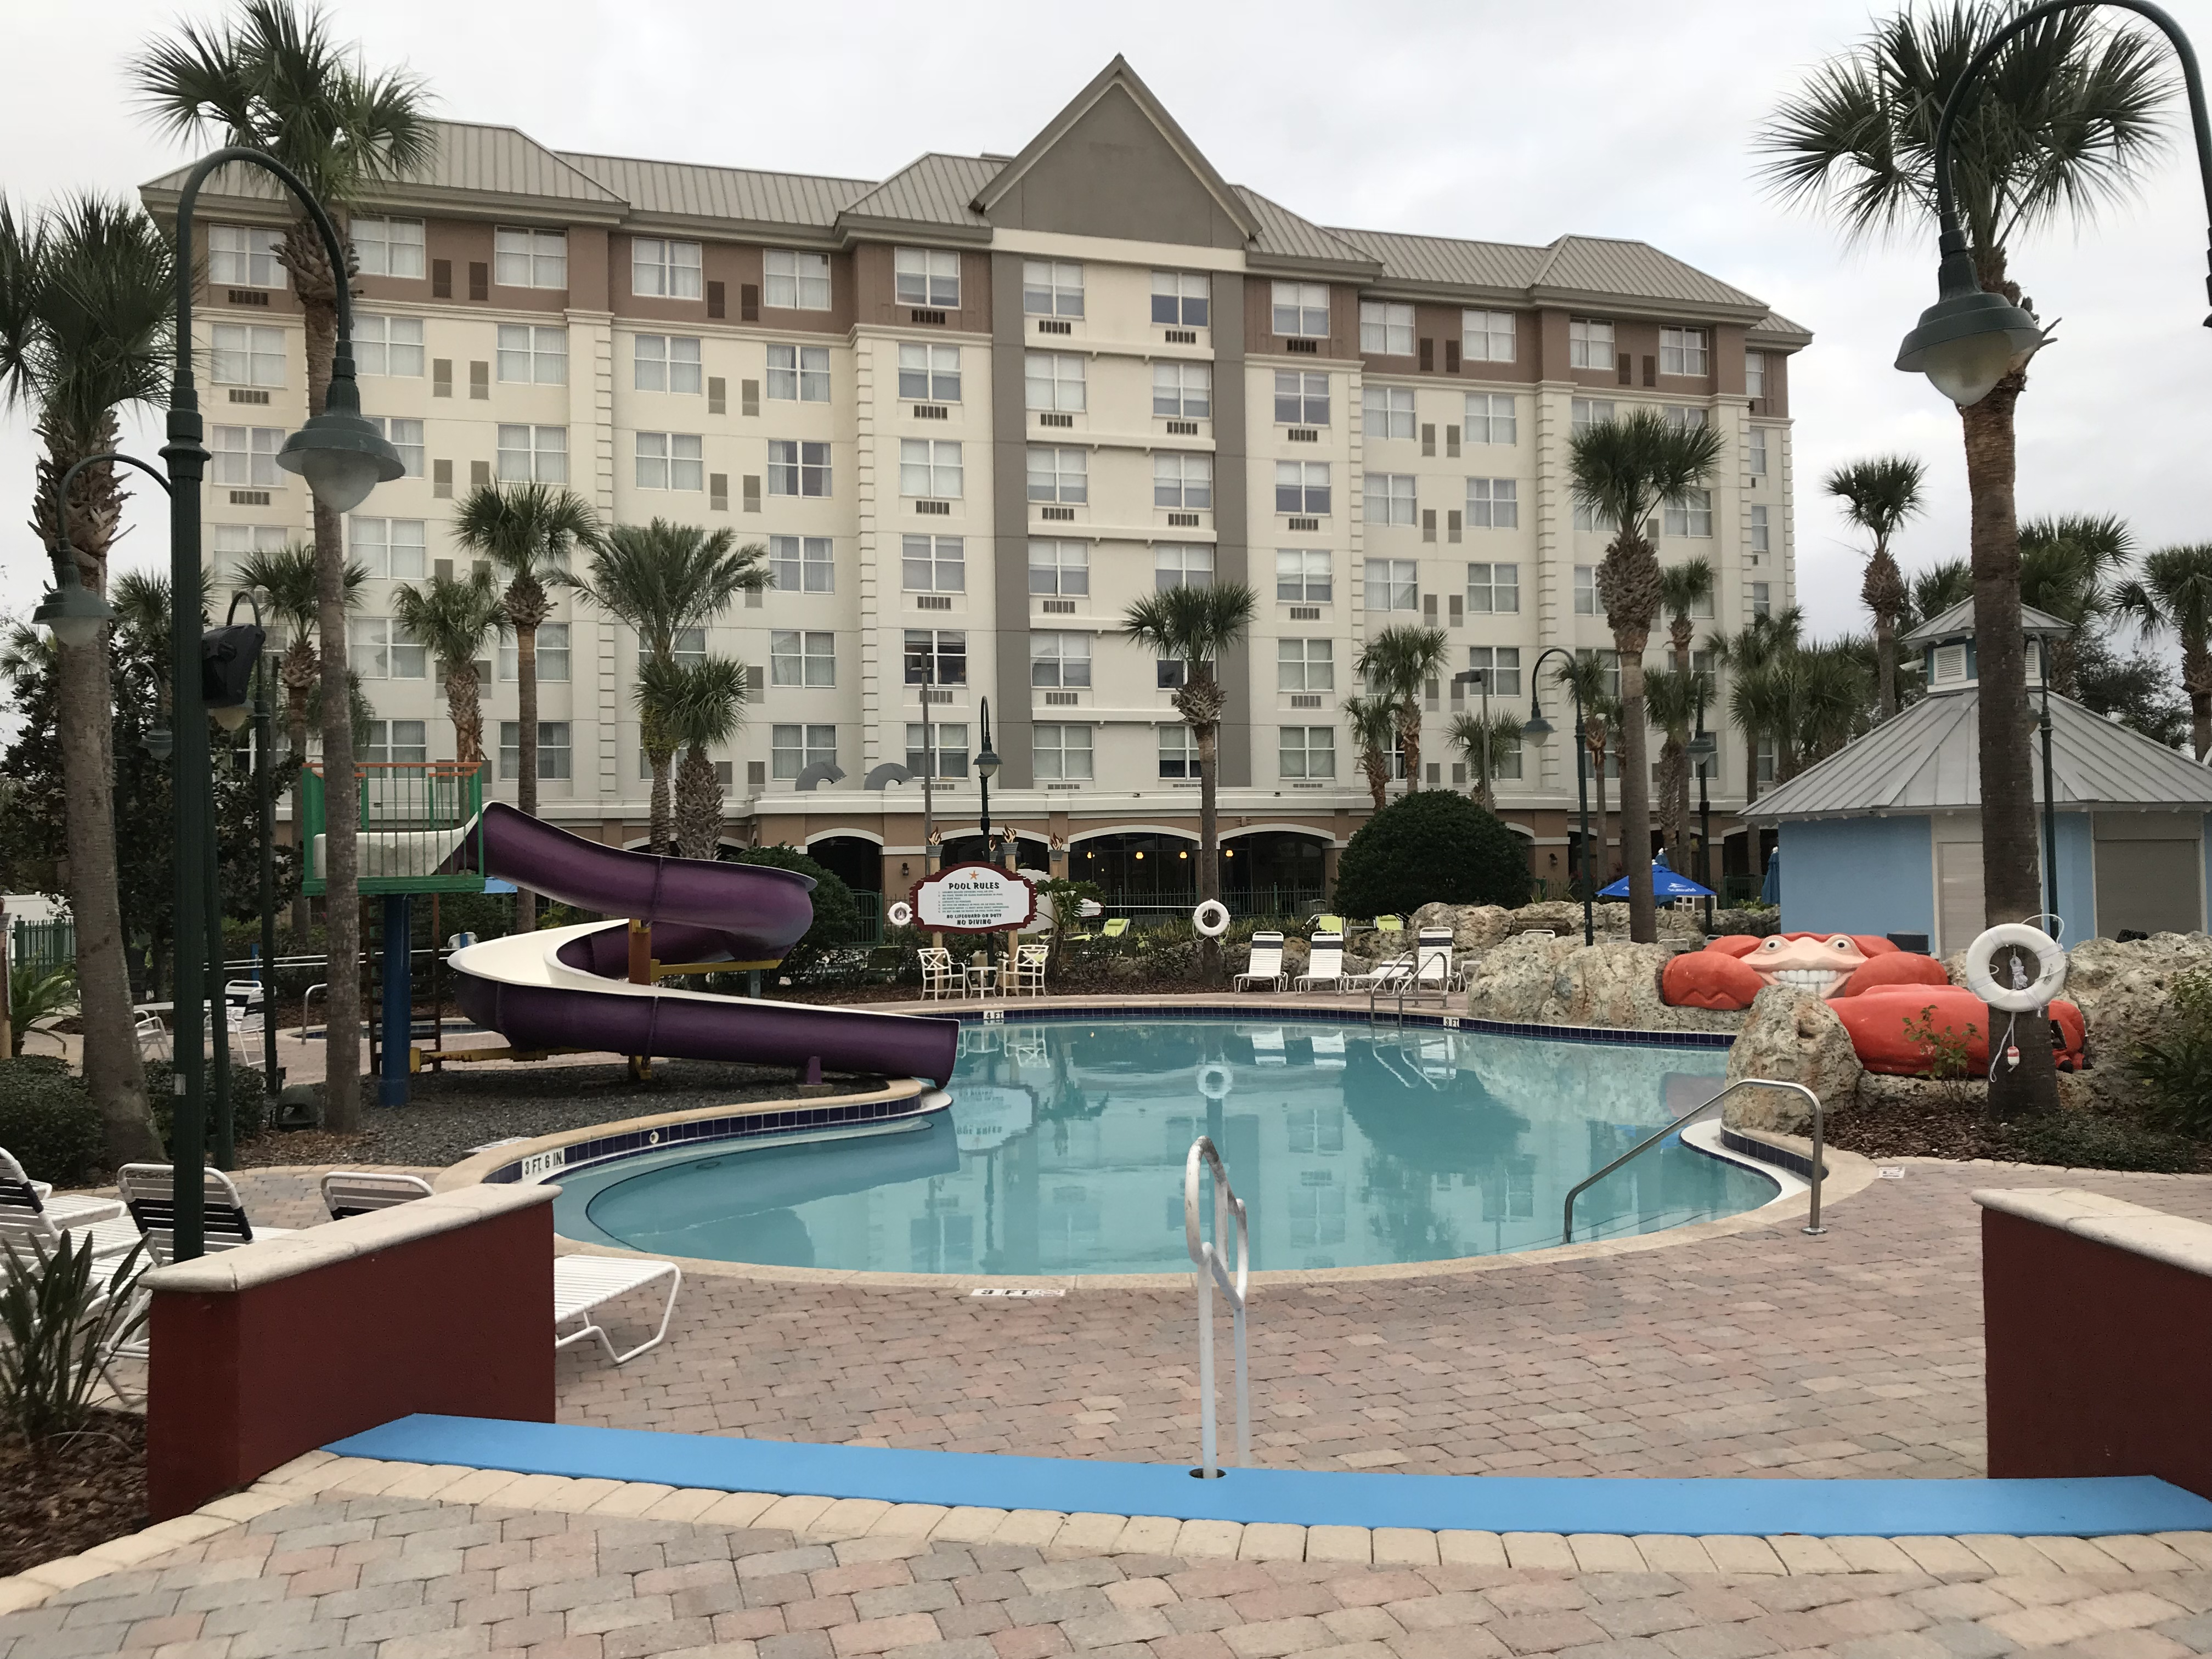 Holiday Inn Express & Suites Lake Buena Vista, Budget-Friendly Disney Hotels, Cheap Hotels Near Disney